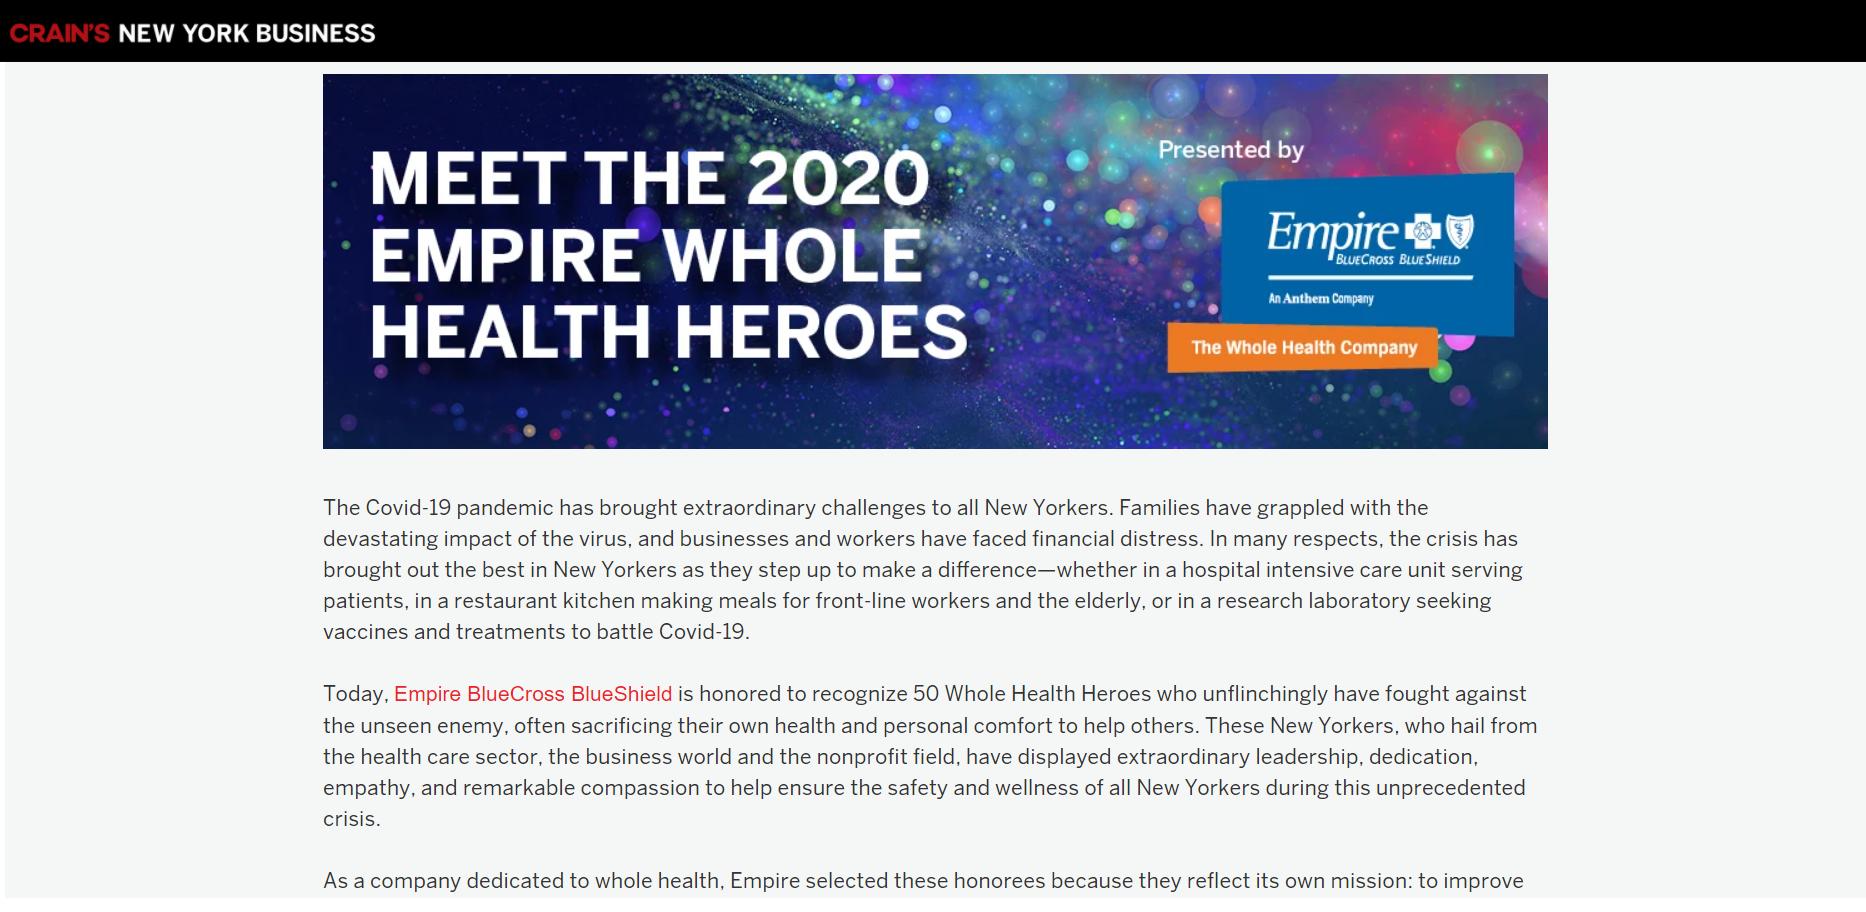 Empire BlueCross BlueShield recognize the 50 Whole Health Heroes